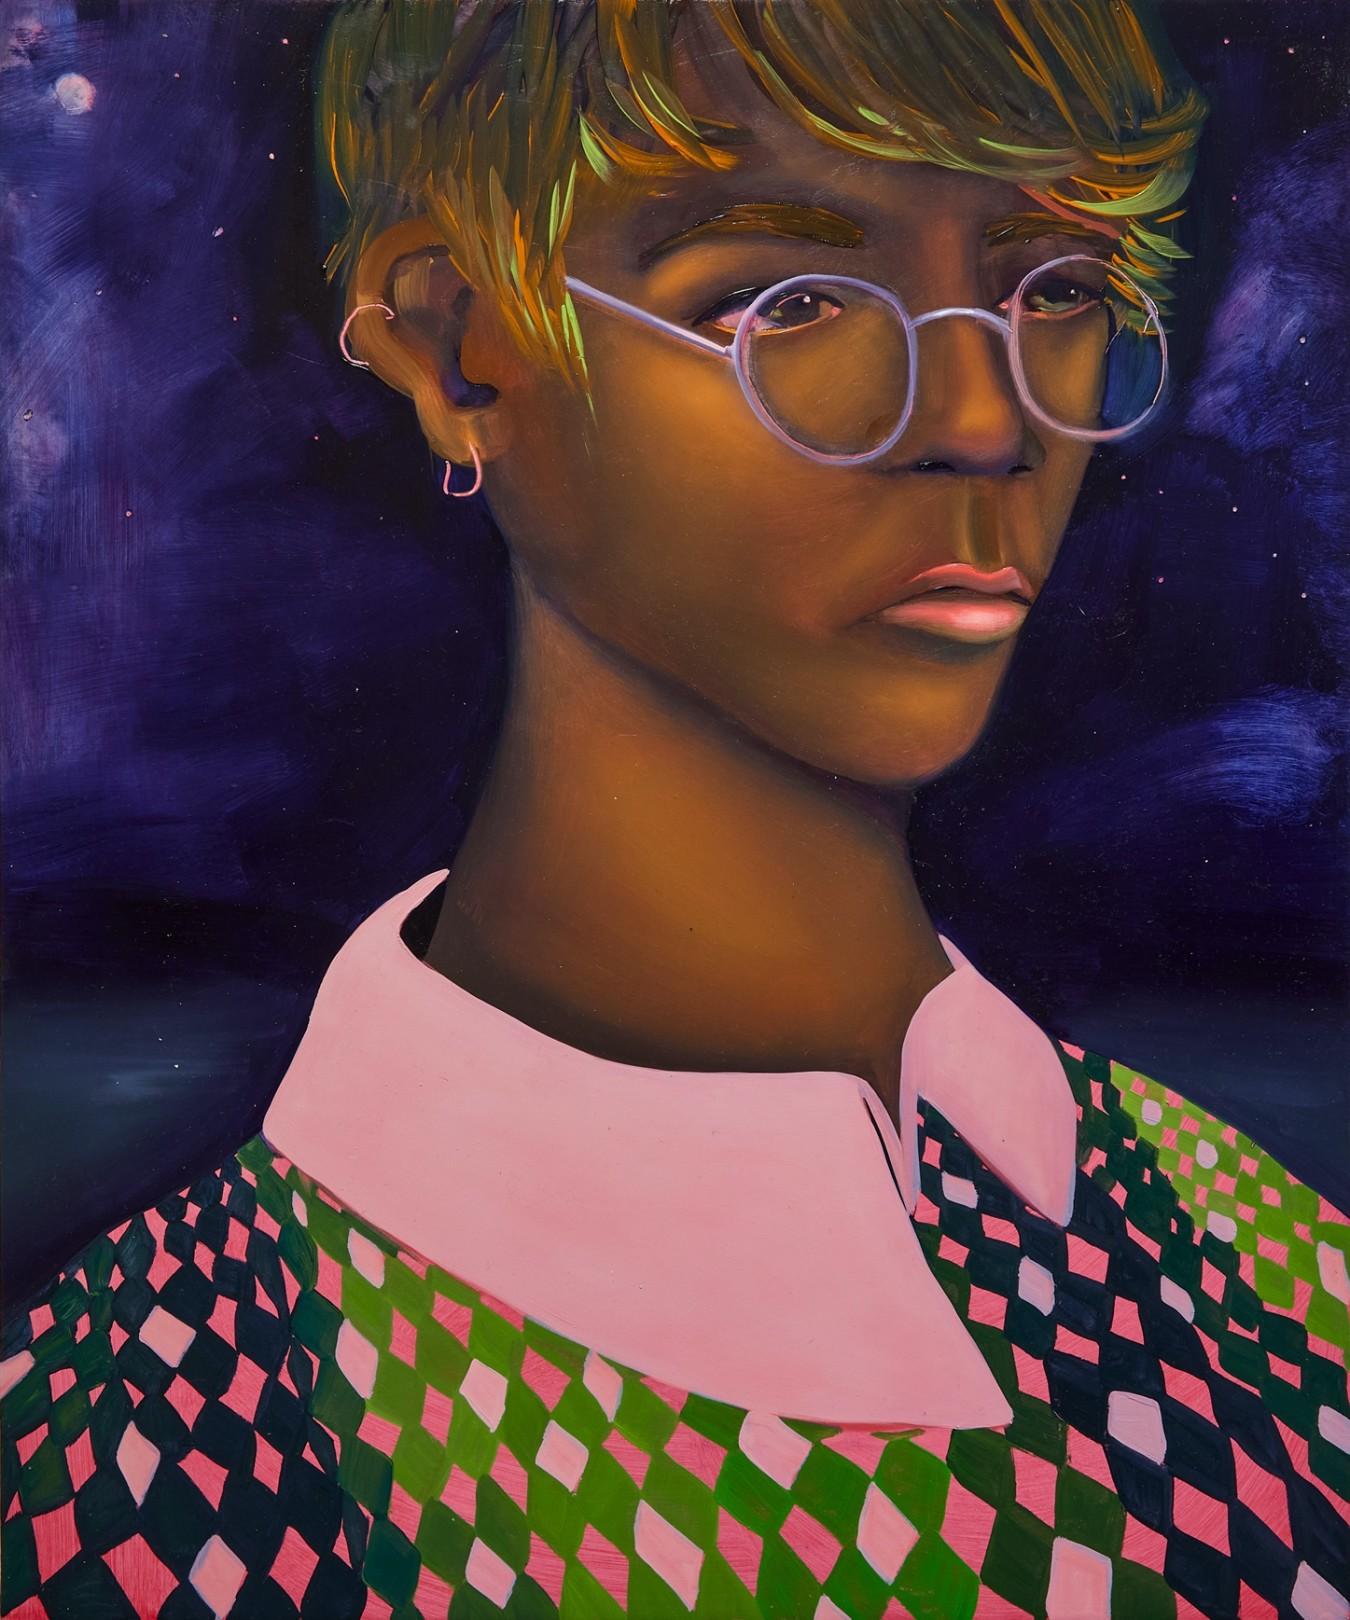 After Dark, 2021 Oil on canvas 61 x 51 cm. / 24 x 20 in.